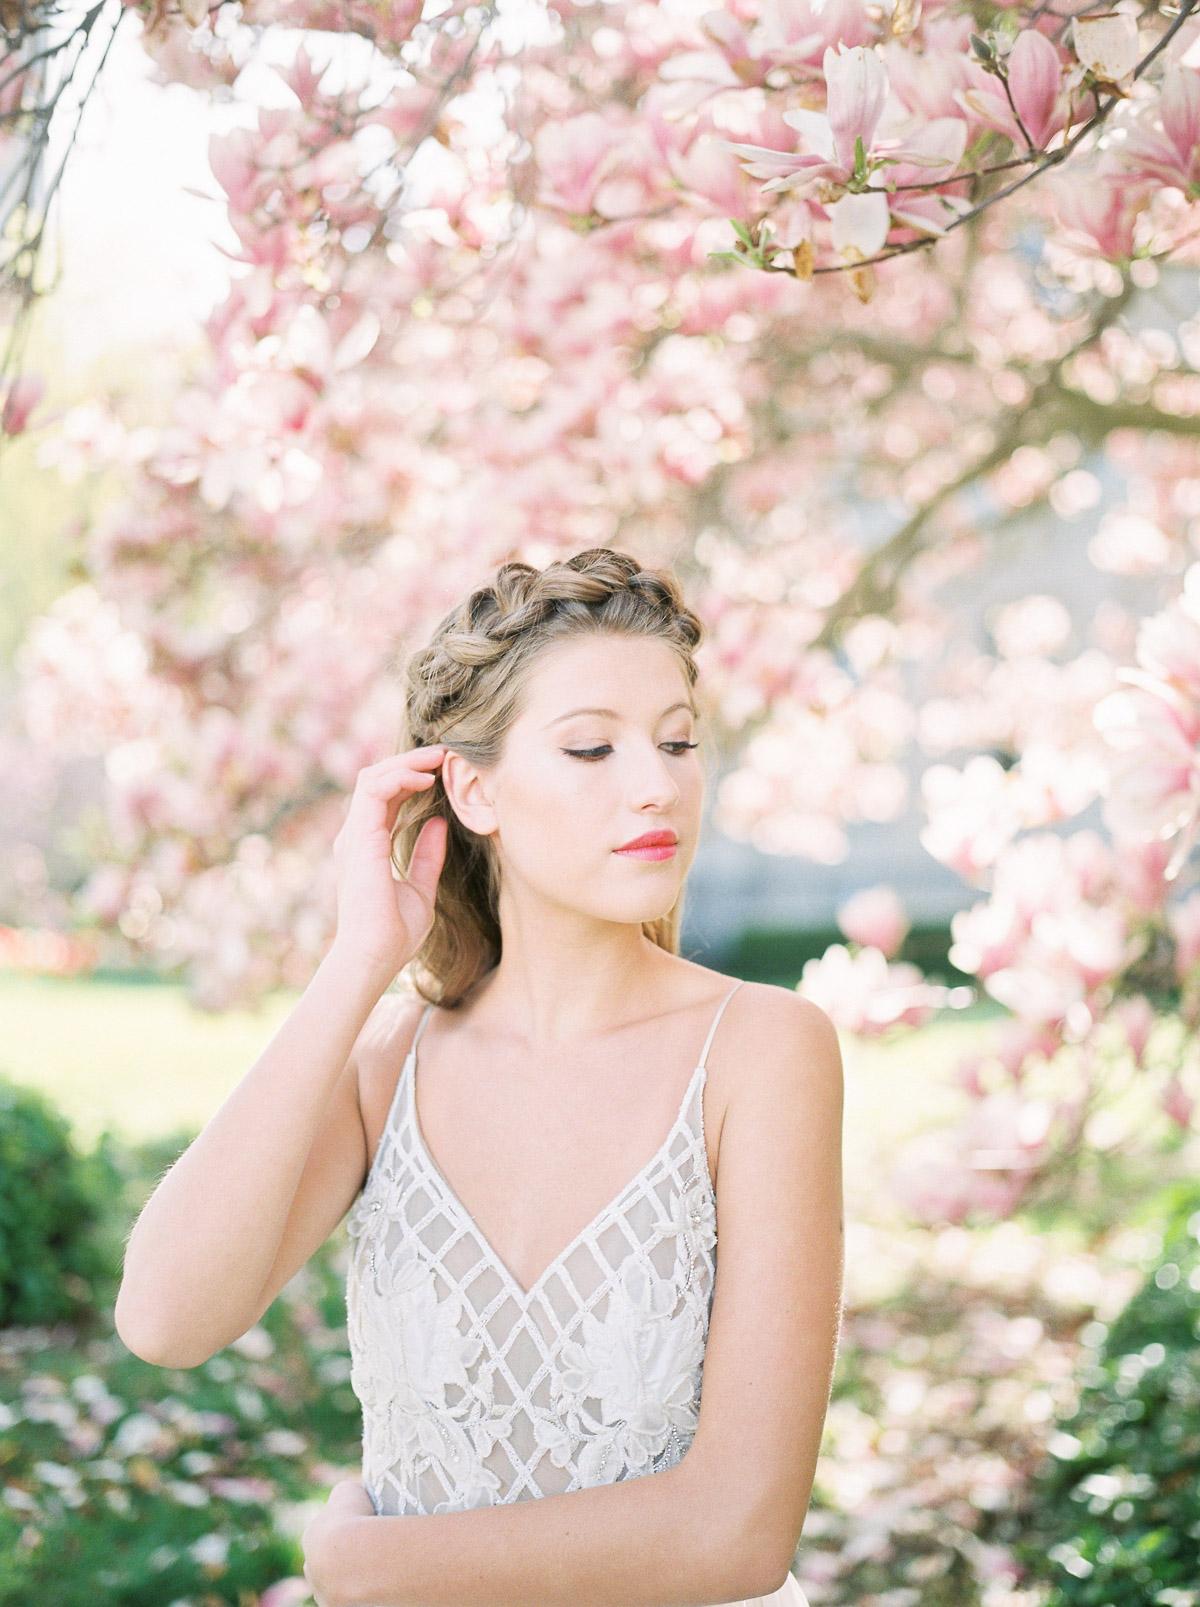 julia-park-photography-vineyard-bride-swish-list-niagara-on-the-lake-wedding-editorial-21.jpg